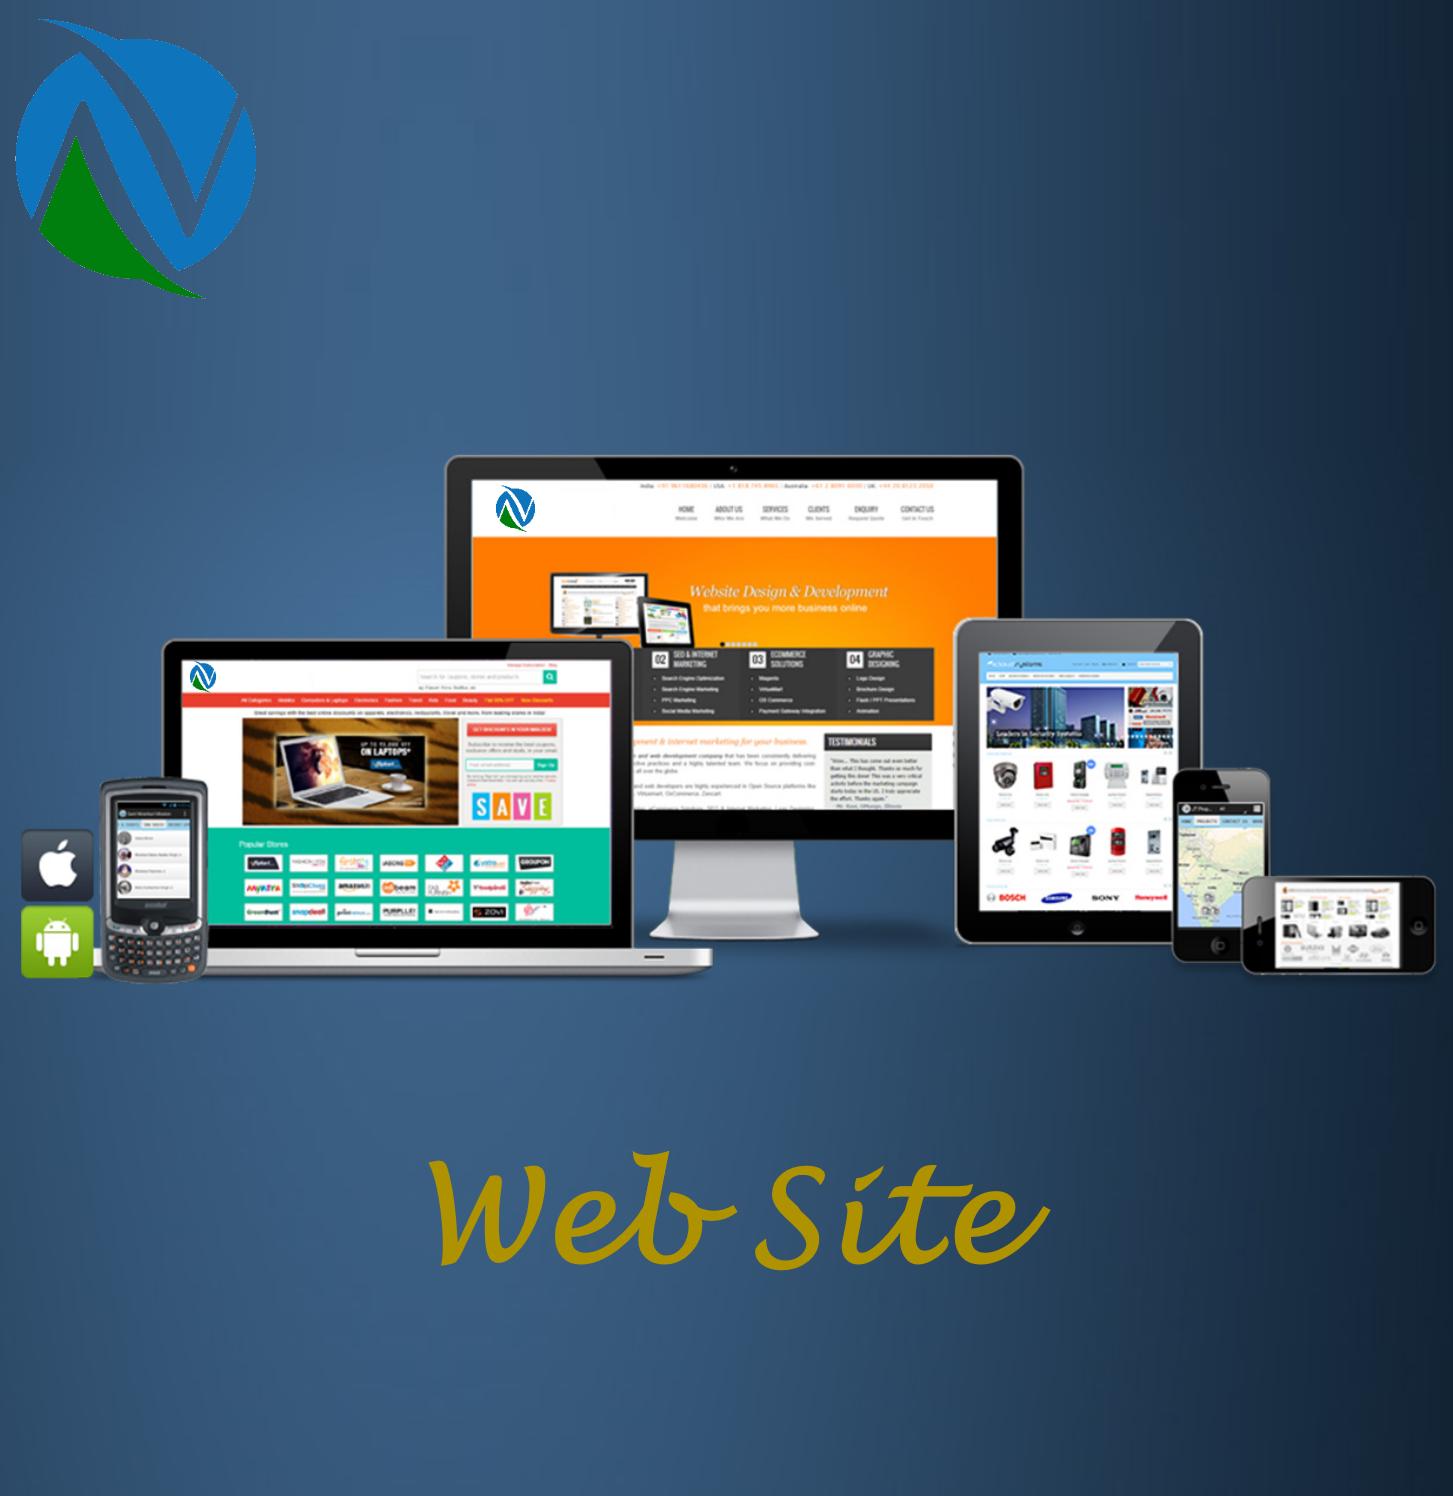 siti web professionali